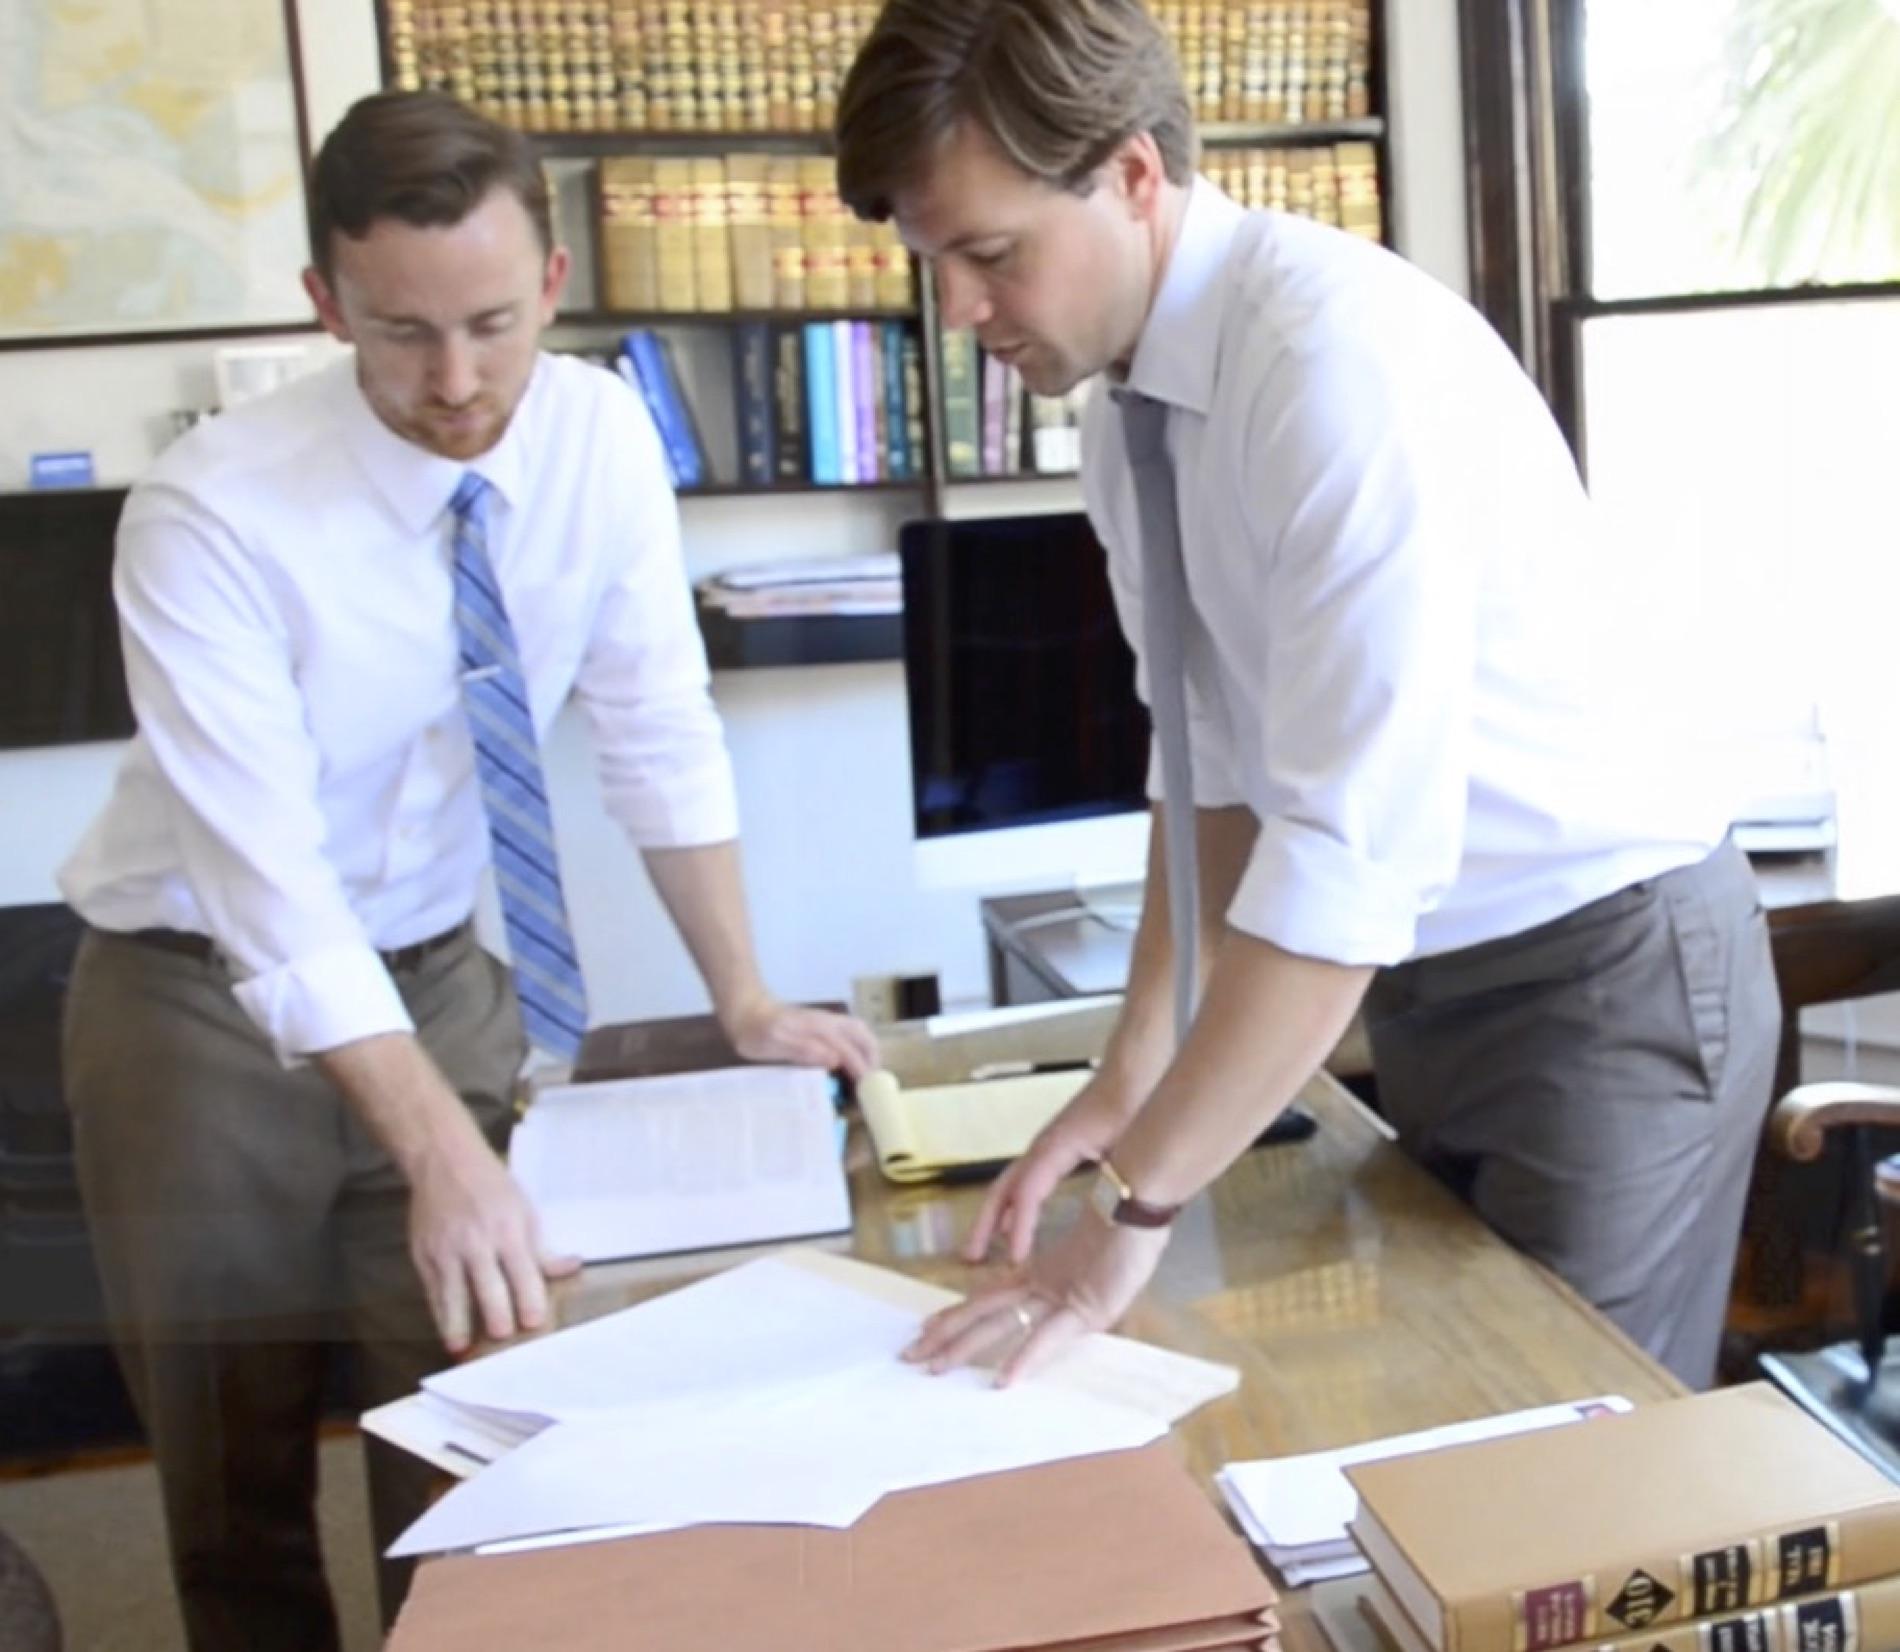 Charleston_Injury_Lawyers_Rankin_Blevins